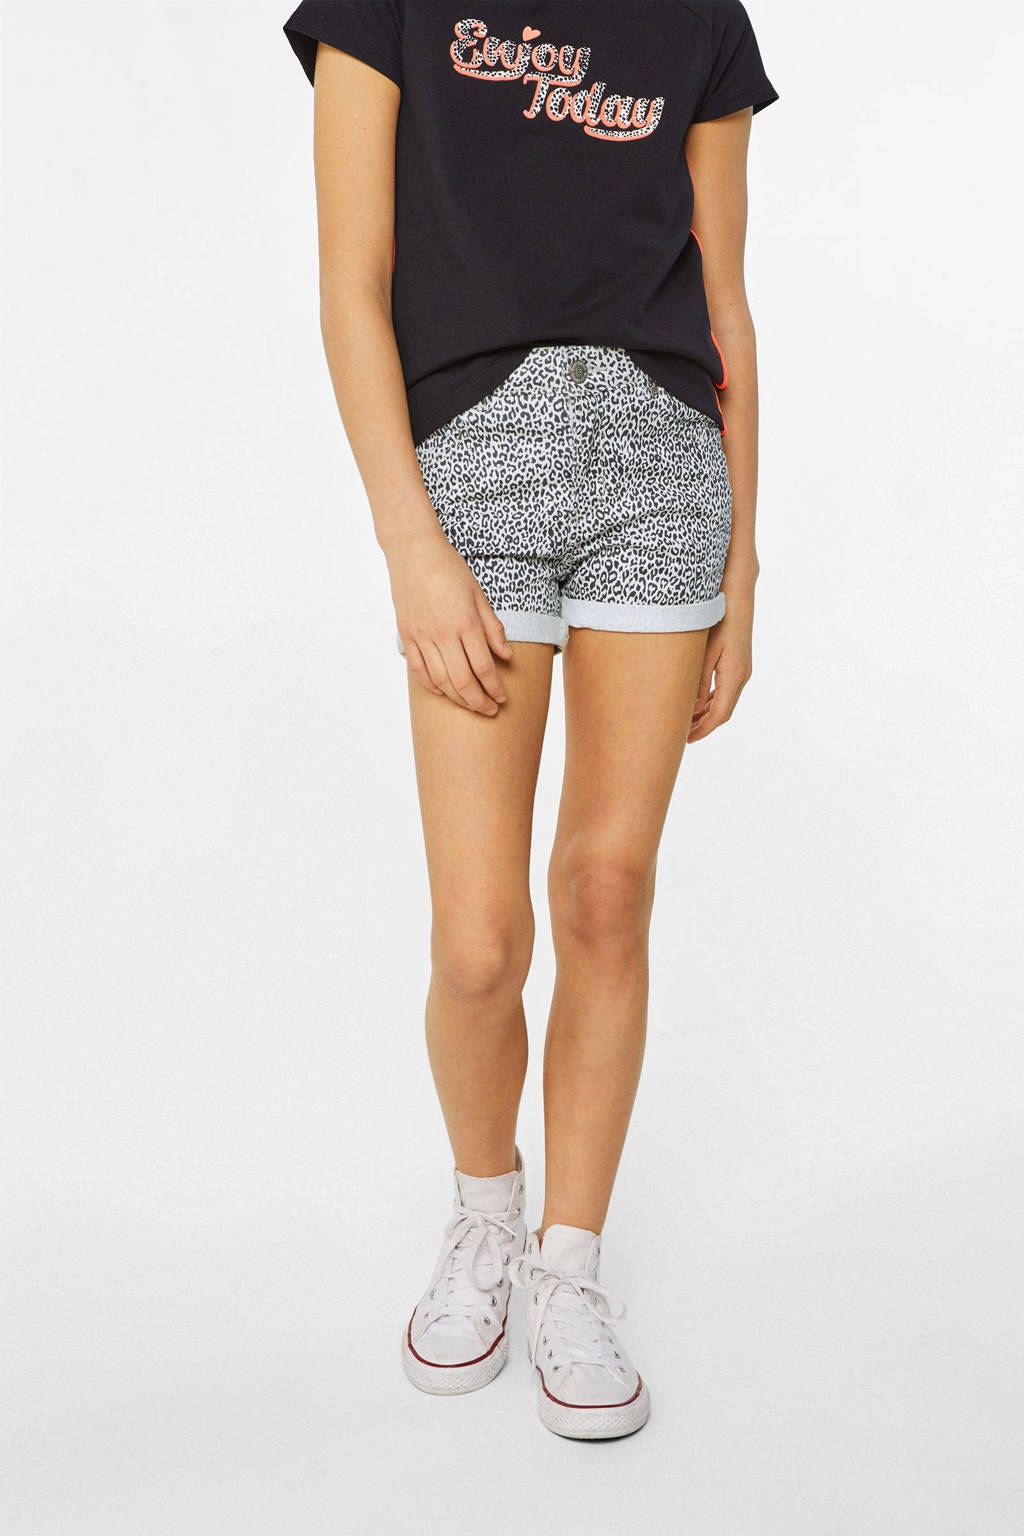 Wonderbaarlijk WE Fashion Blue Ridge korte broek met panterprint wit/zwart | wehkamp TF-73